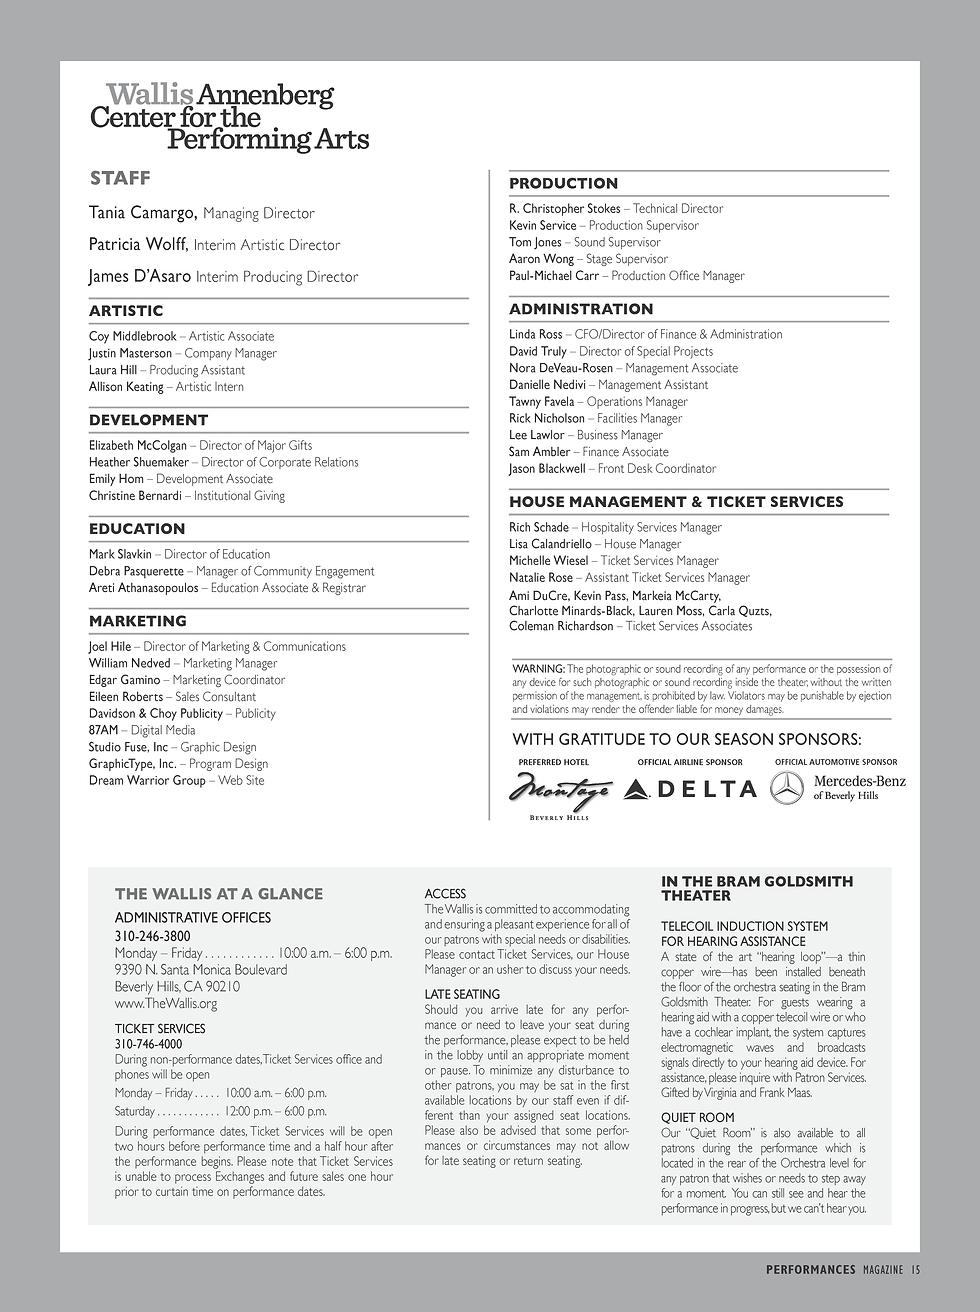 Wallis Annenberg Center 2015_Page_15.png